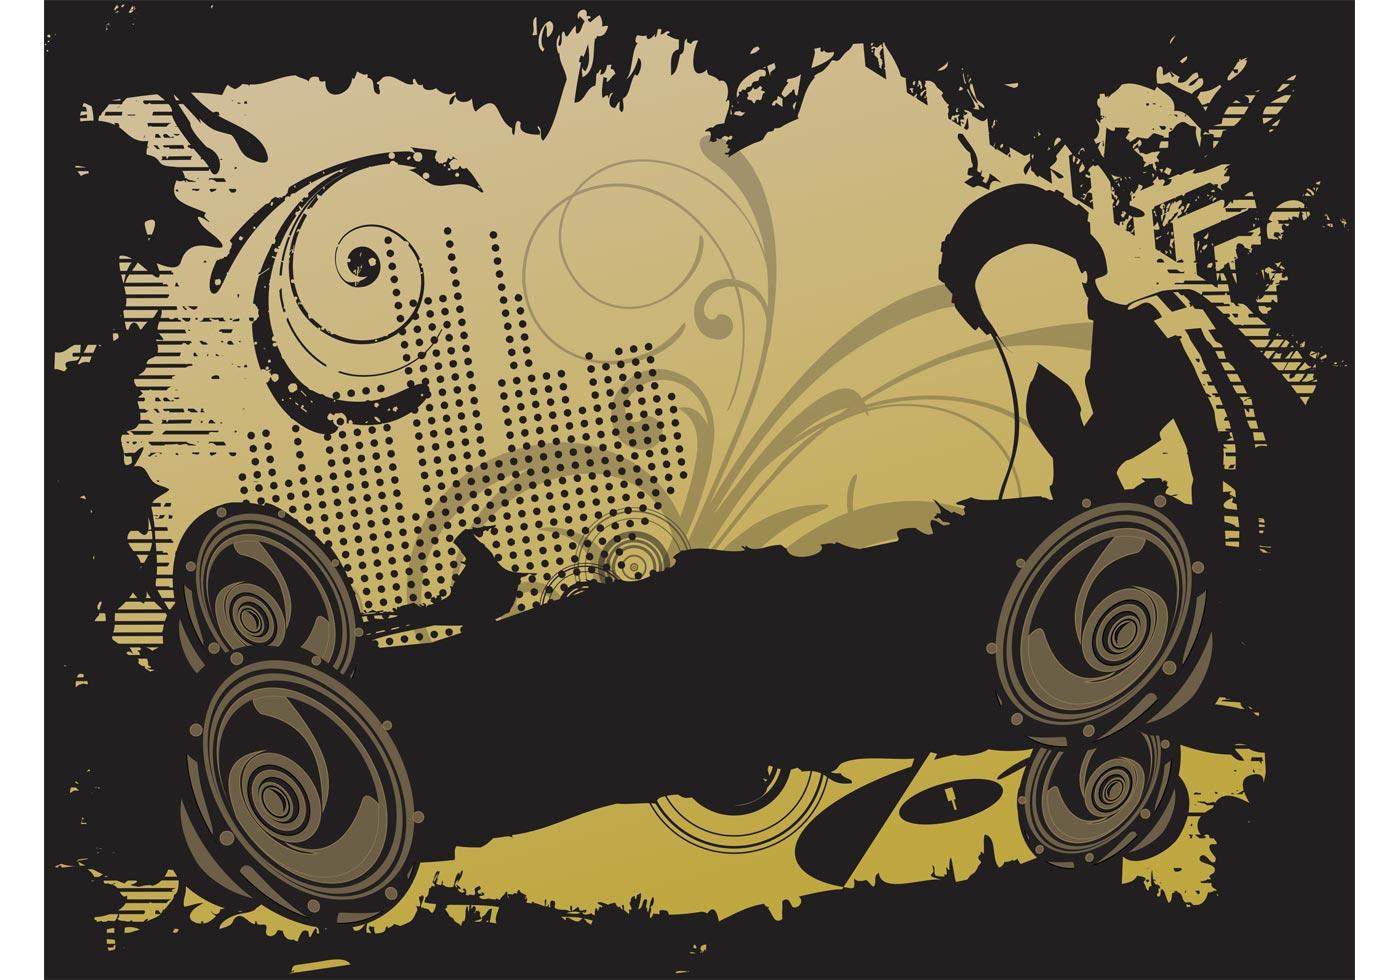 Dj Party Vector Download Free Vector Art Stock Graphics